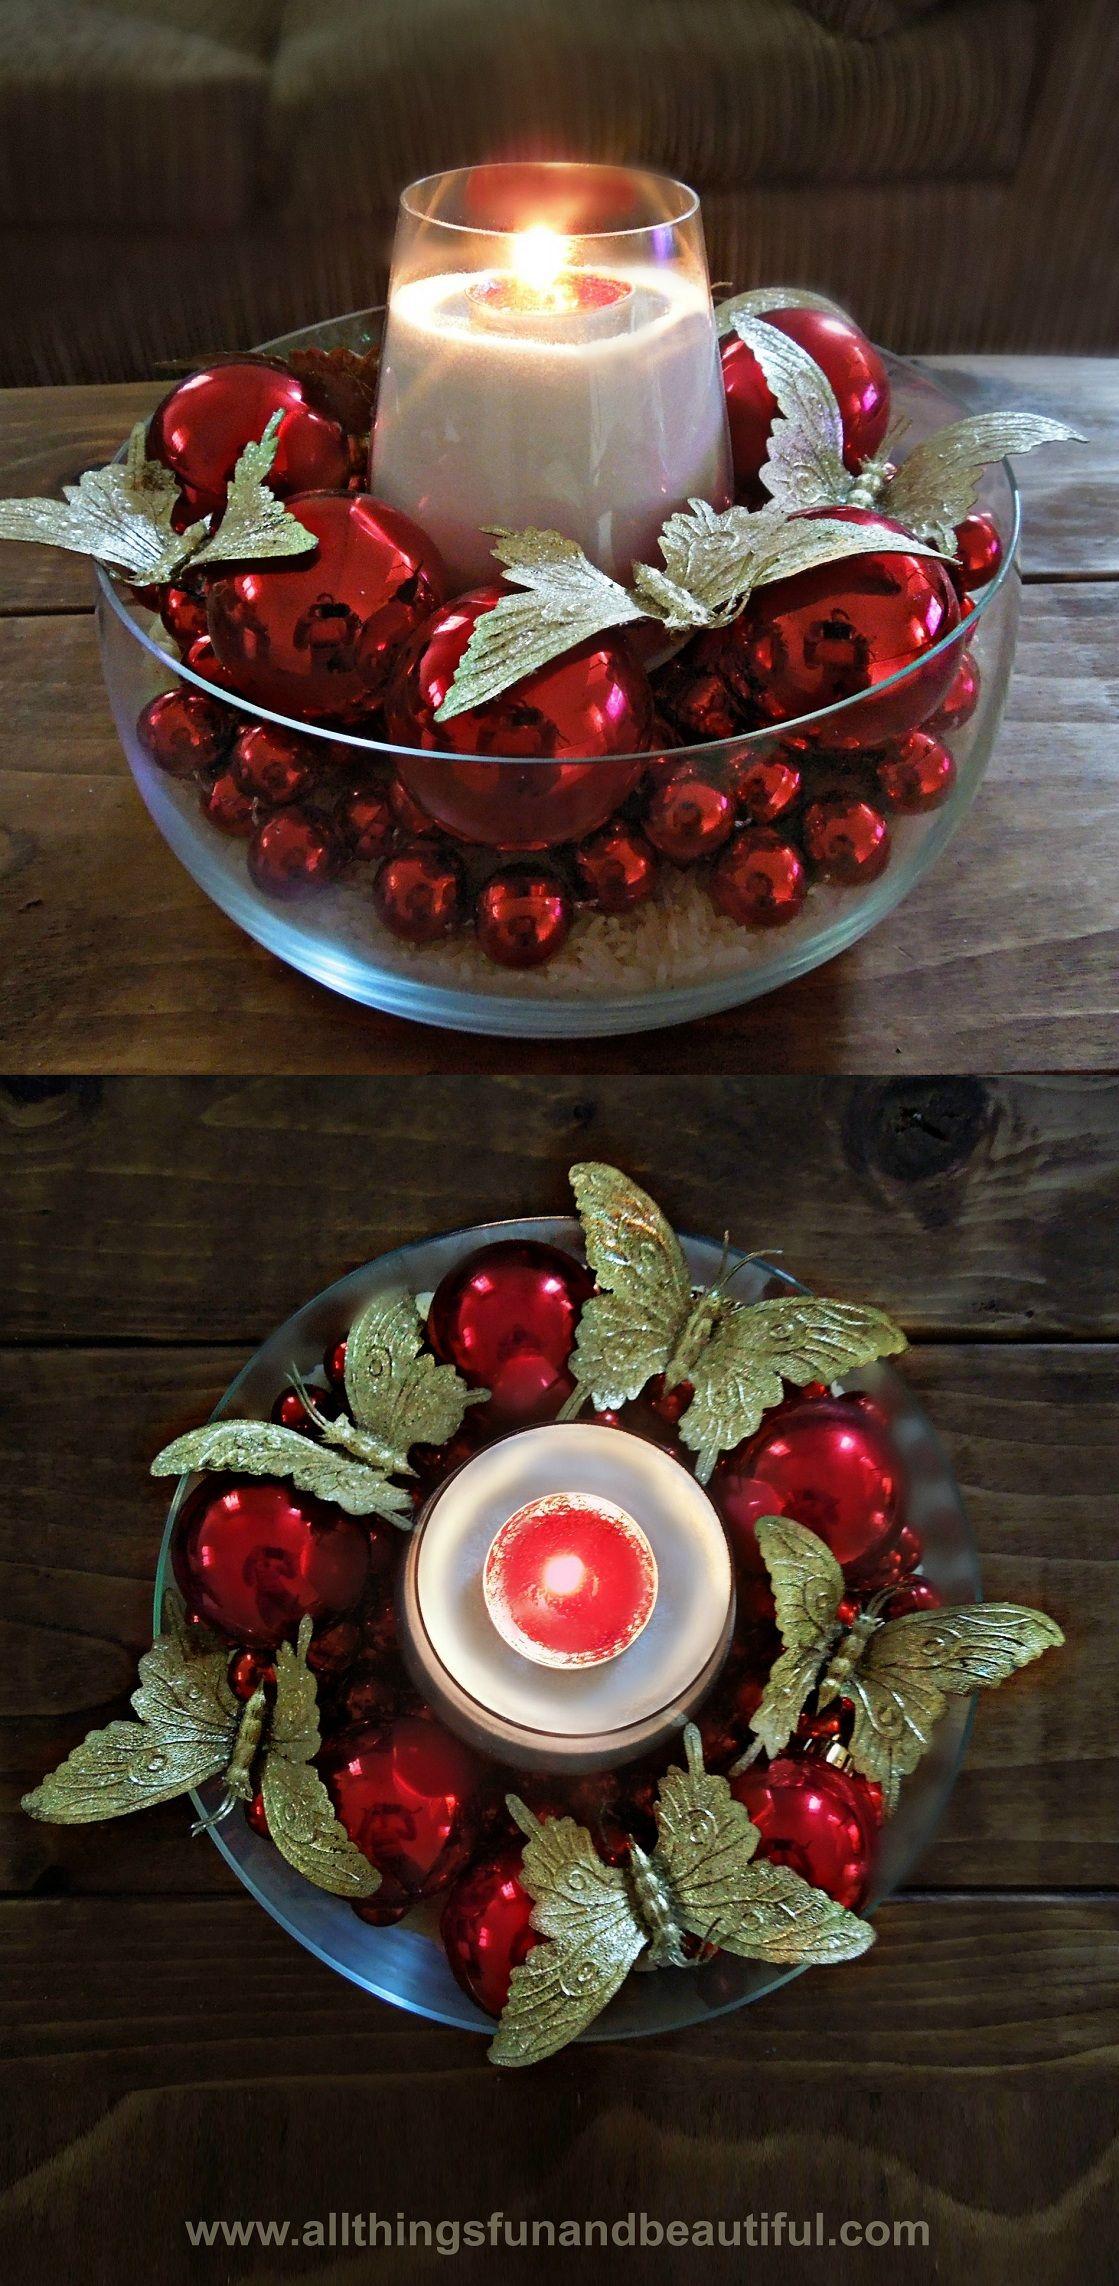 Httpwwwallthingsfunandbeautifulcomchristmas Recipeschristmas